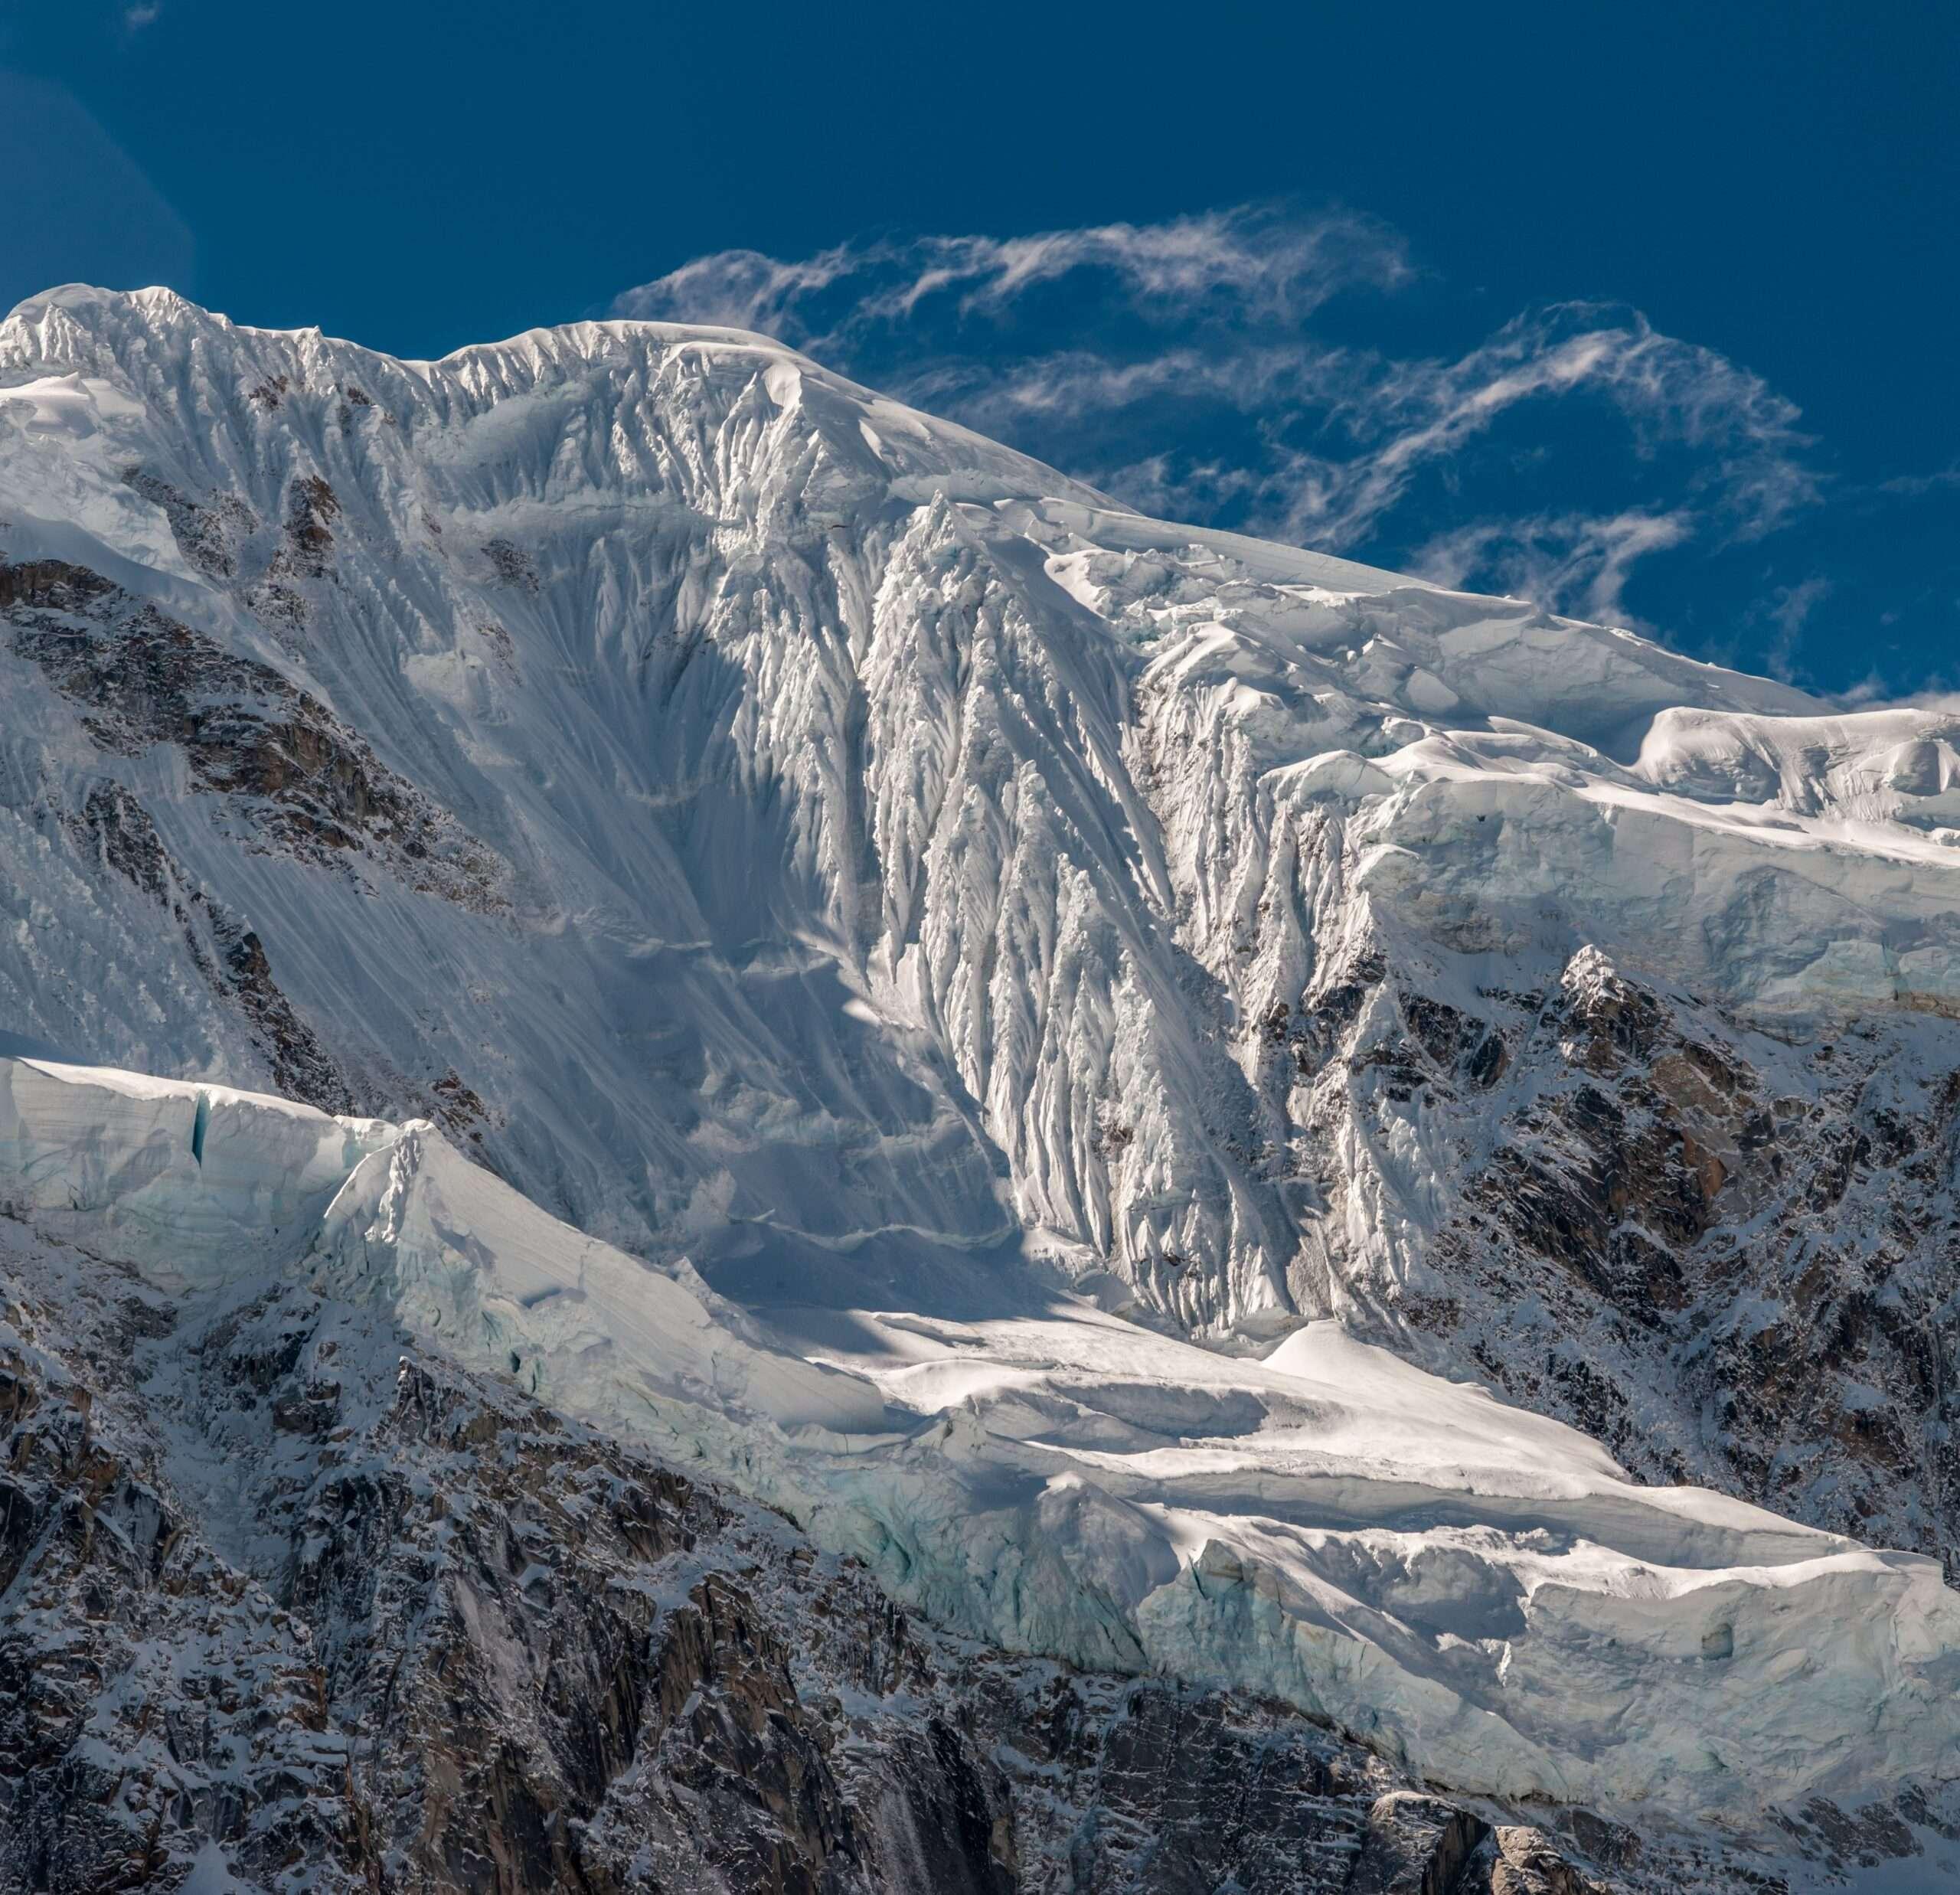 snow covered mountains along the Salkantay Trek